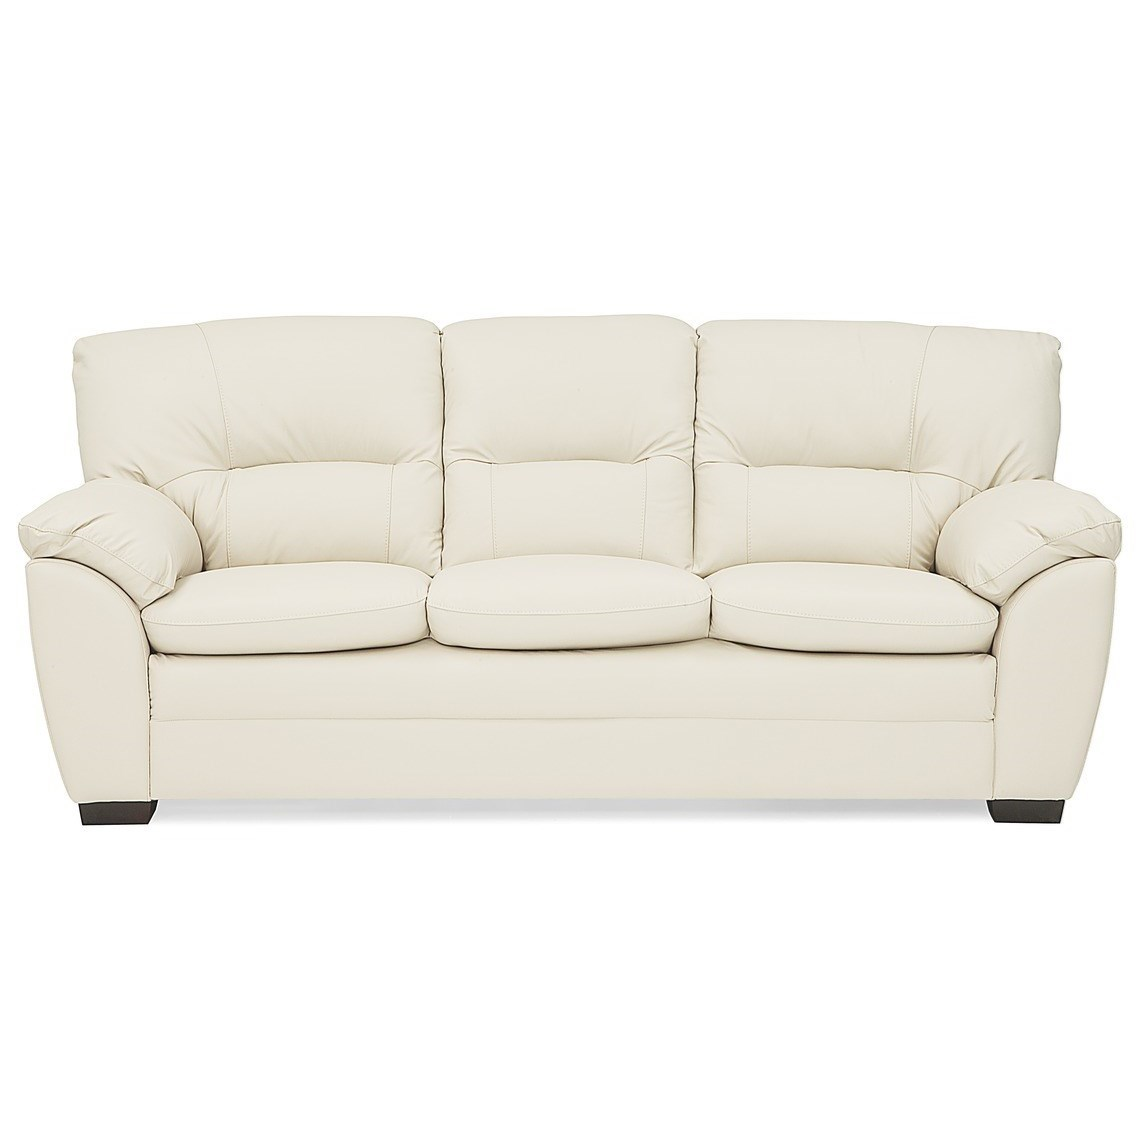 Amisk Sofa by Palliser at Esprit Decor Home Furnishings